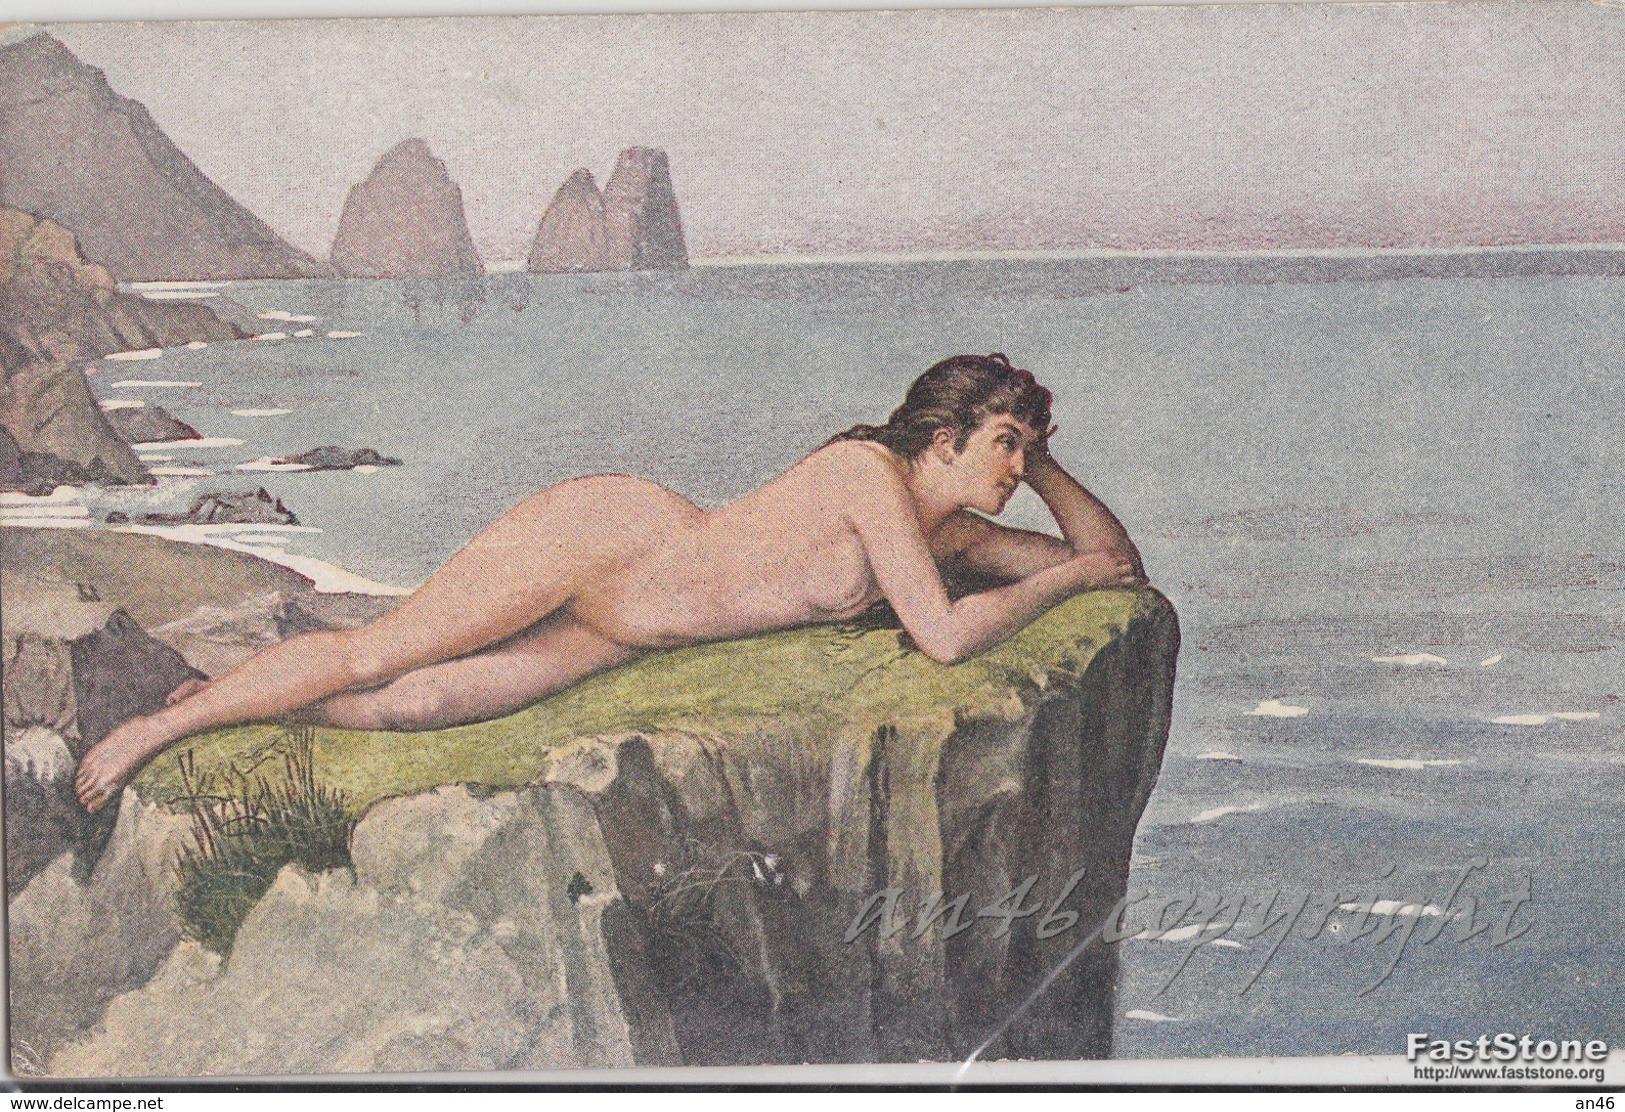 "NU_NUE_NUS_NUDE_NAKED WOMAN-NUDI ARTISTICI-""Traumerei"" S.WAGNER Pinxit-Serie N°1522 -Original D'epoca 100%- - Pittura & Quadri"